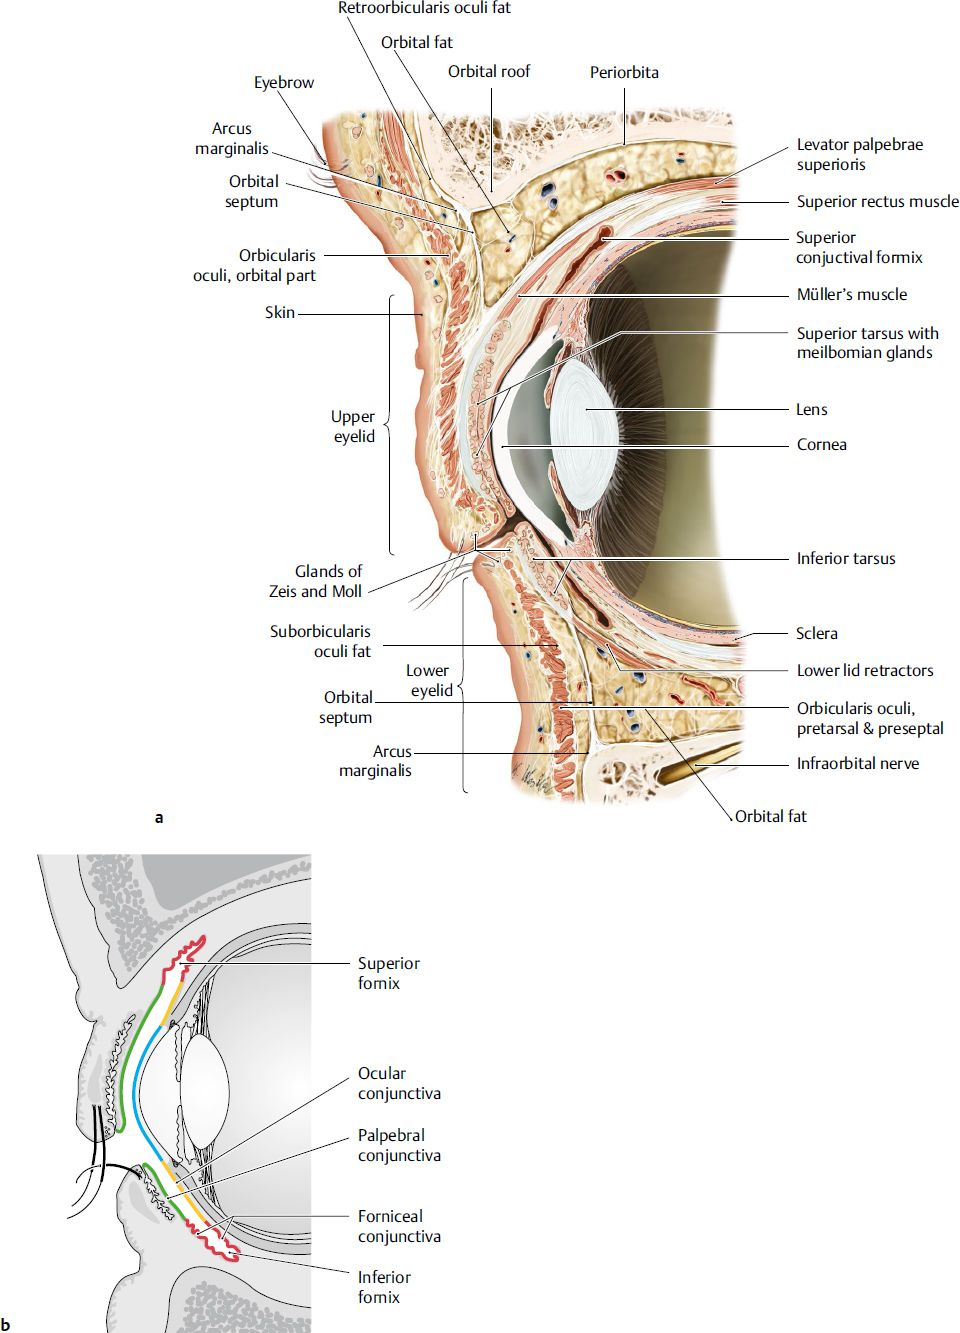 Pin by Lisa Cohen on Eye Anatomy | Pinterest | Eyelid surgery ...